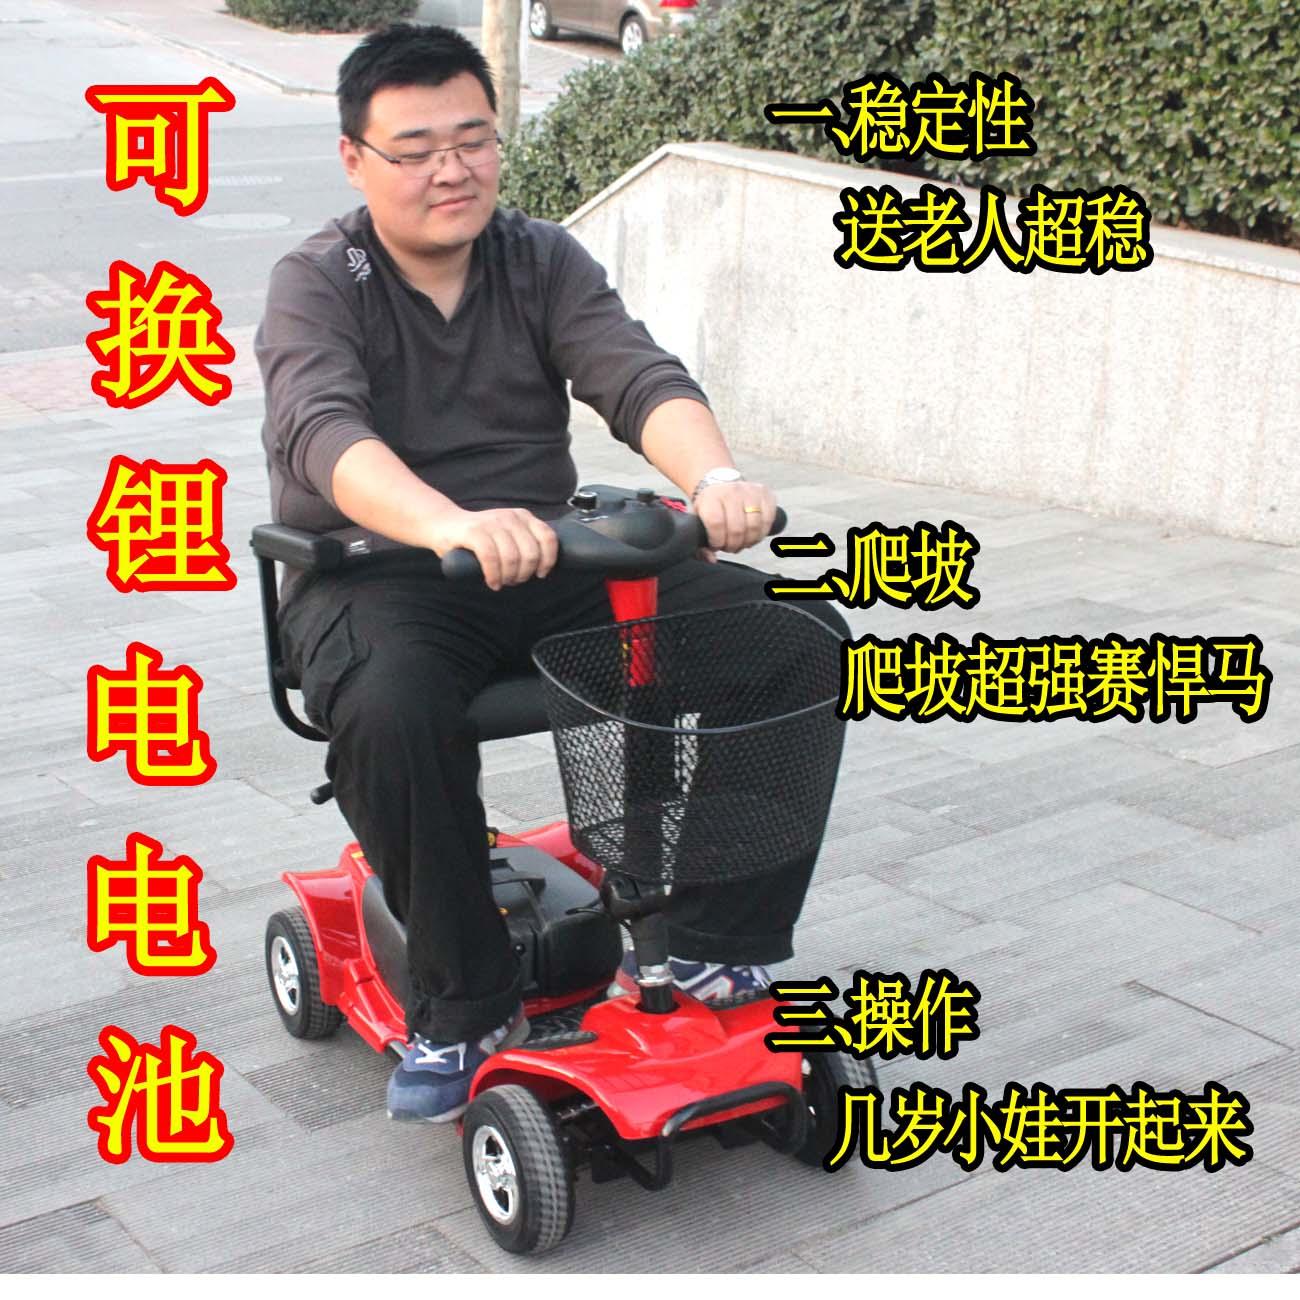 Kang Yi mukhzeer mohamad shahimin and kang nan khor integrated waveguide for biosensor application